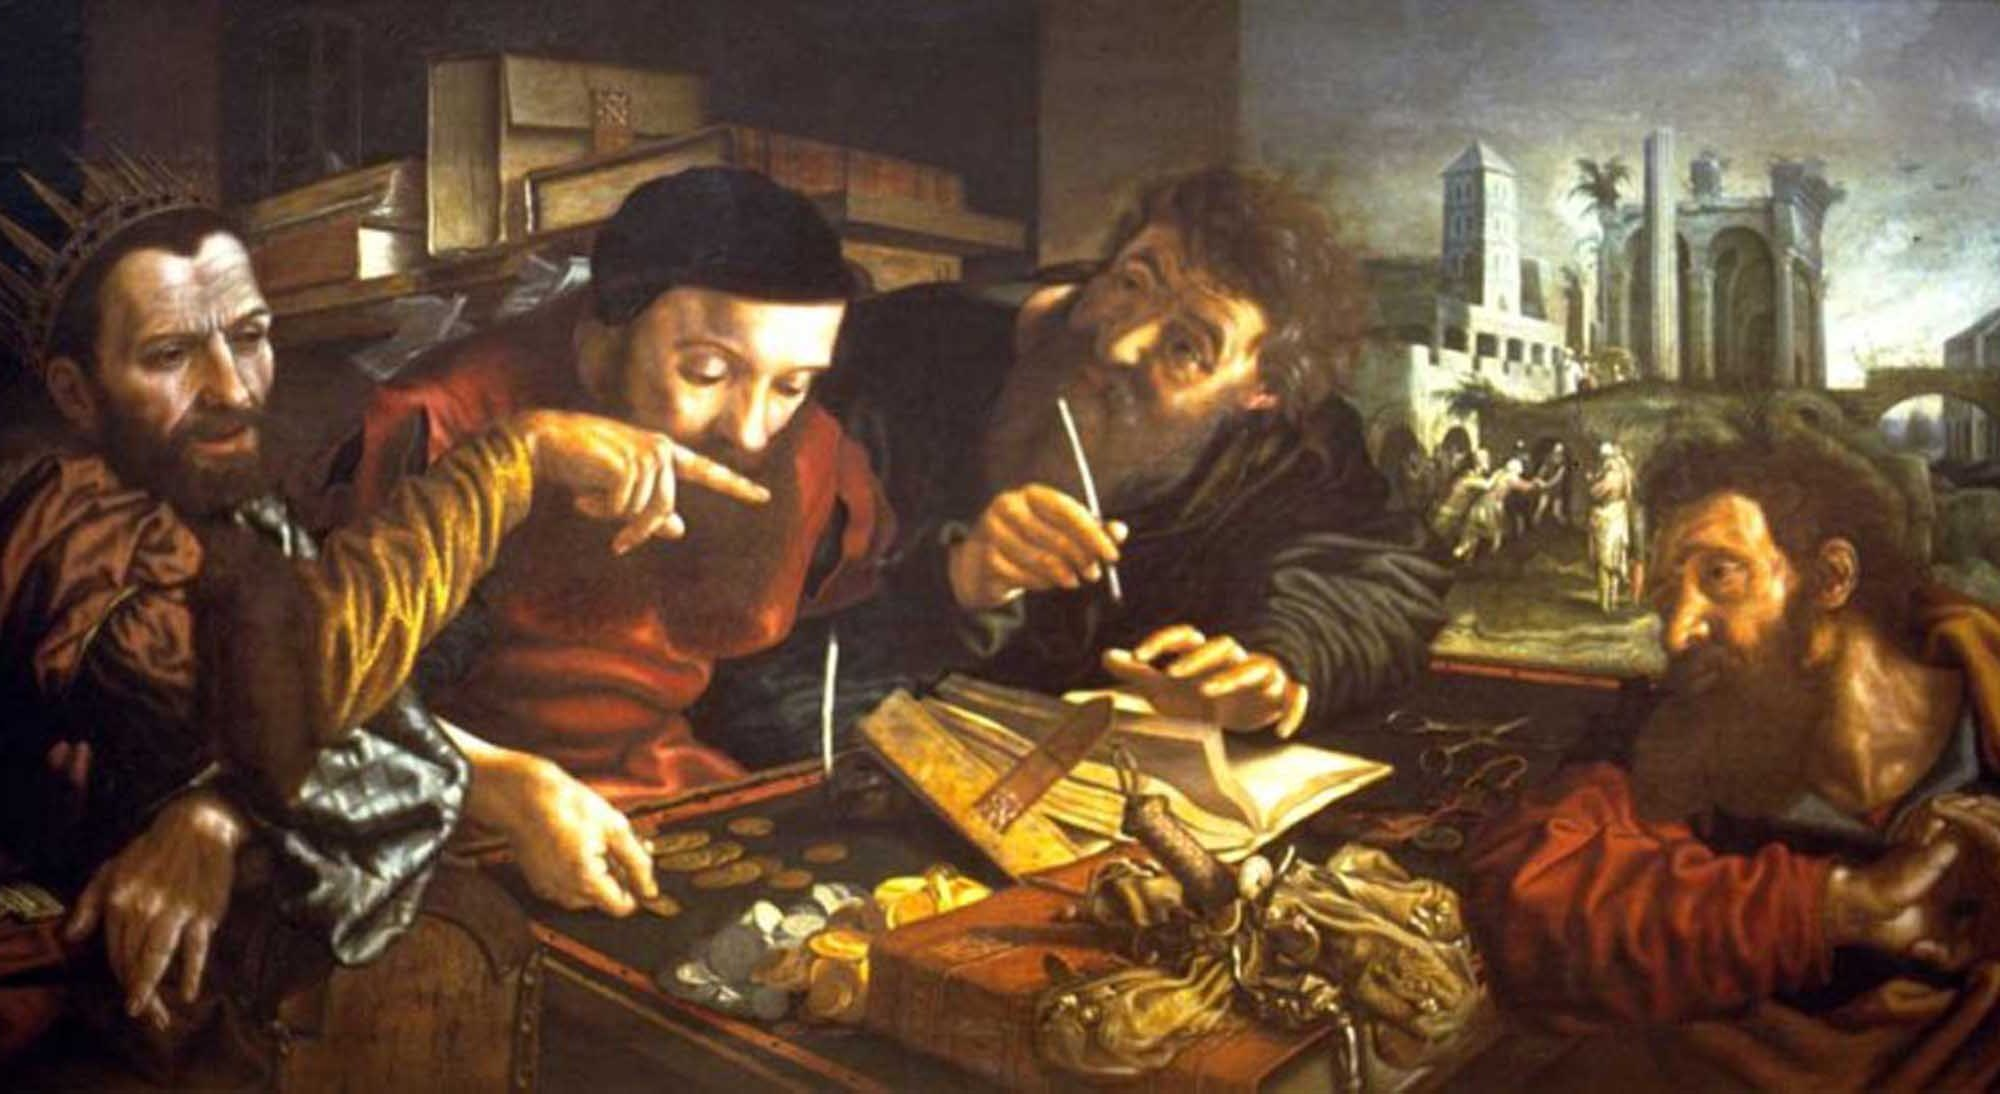 Jan van HEMESSEN (c. 1500-c. 1575); Parable of the unmerciful servant.; 1548-1552; Painting; Ann Arbor. University of Michigan Museum of Art.; Netherlands.